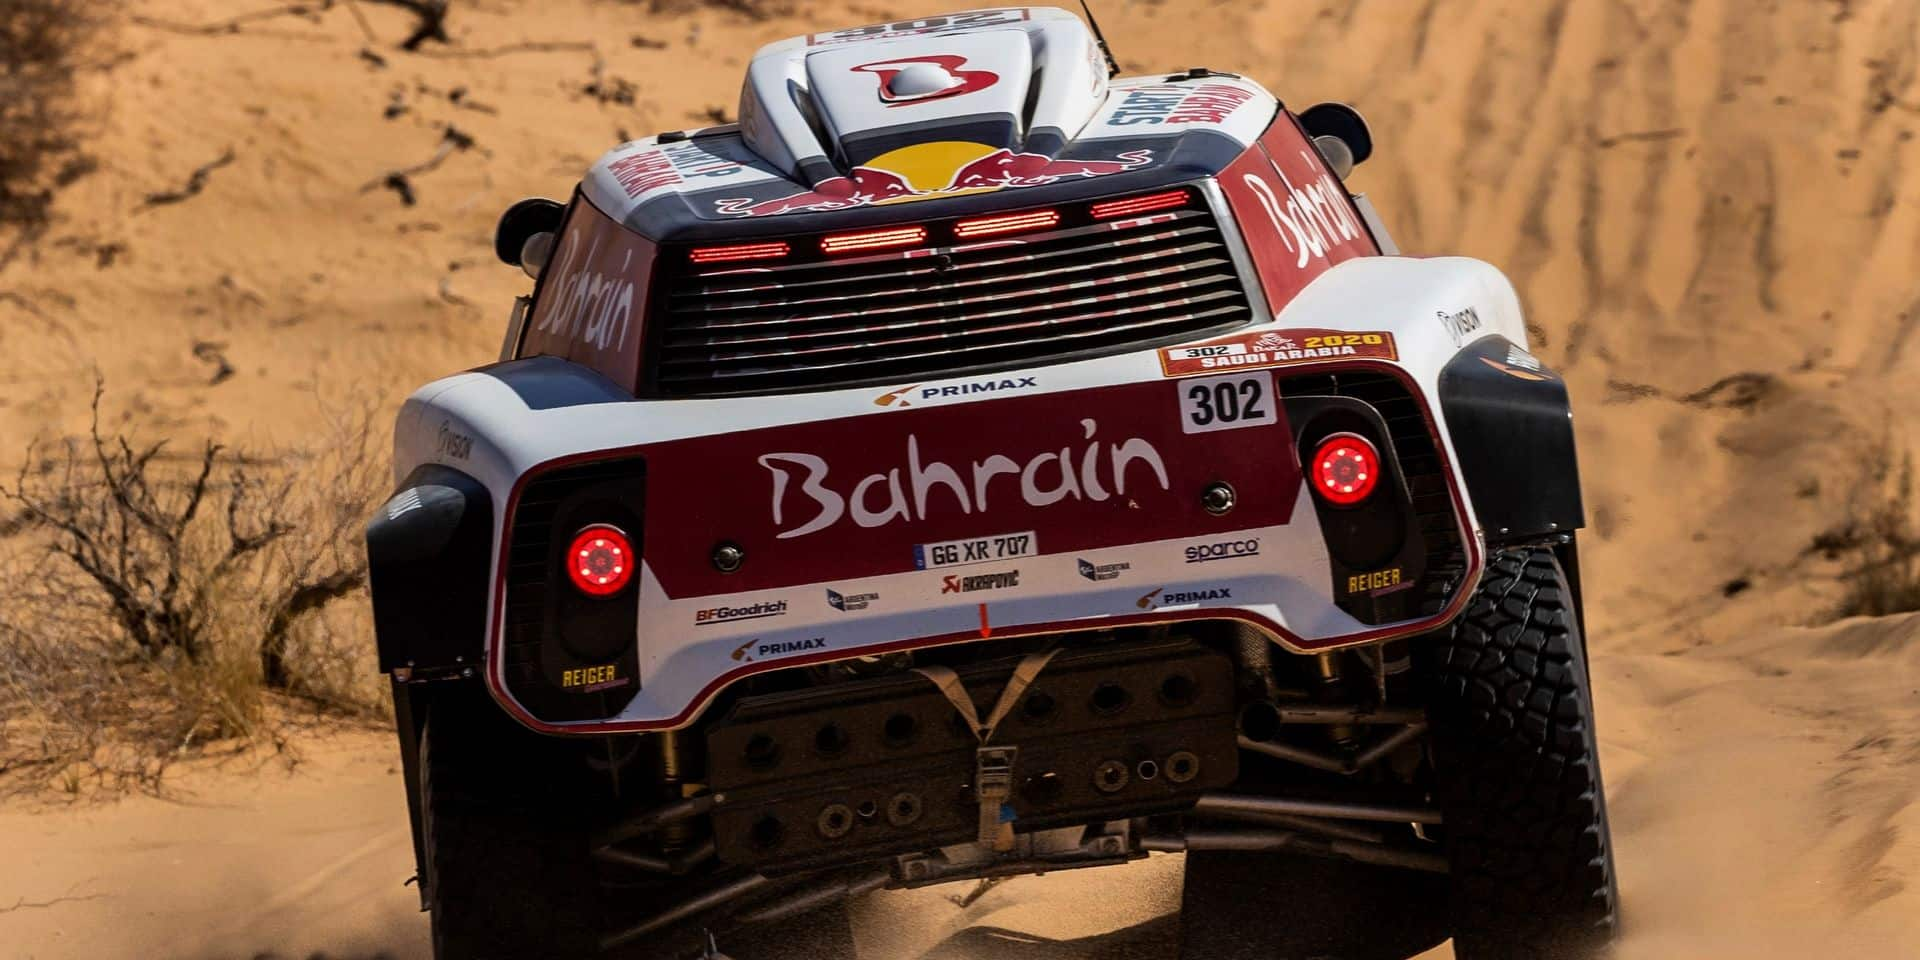 Dakar 2020: Victoire de Peterhansel, Sainz reste en tête